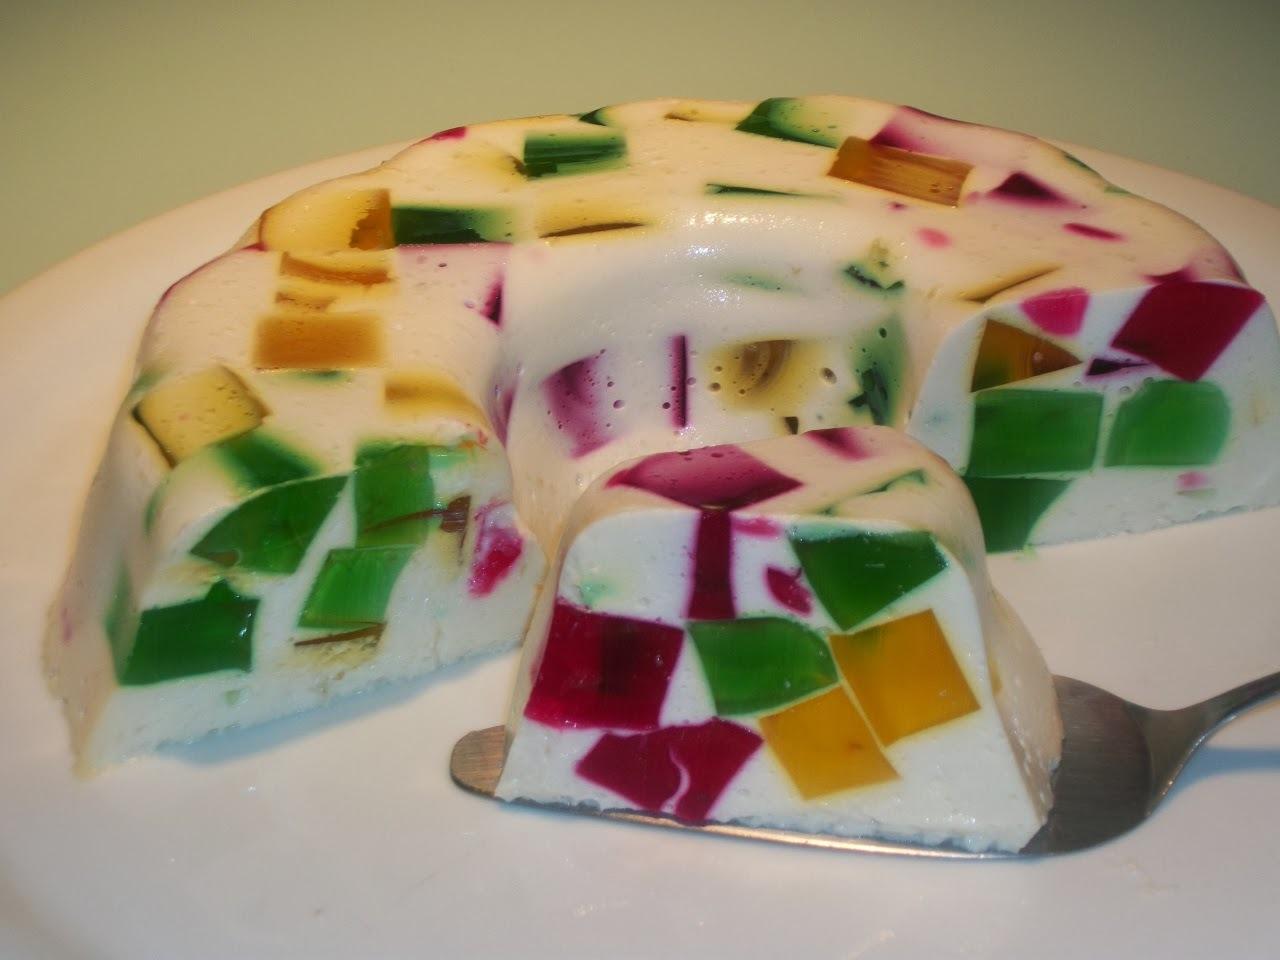 gelatina feita no liquidificador com leite condensado e creme de leite